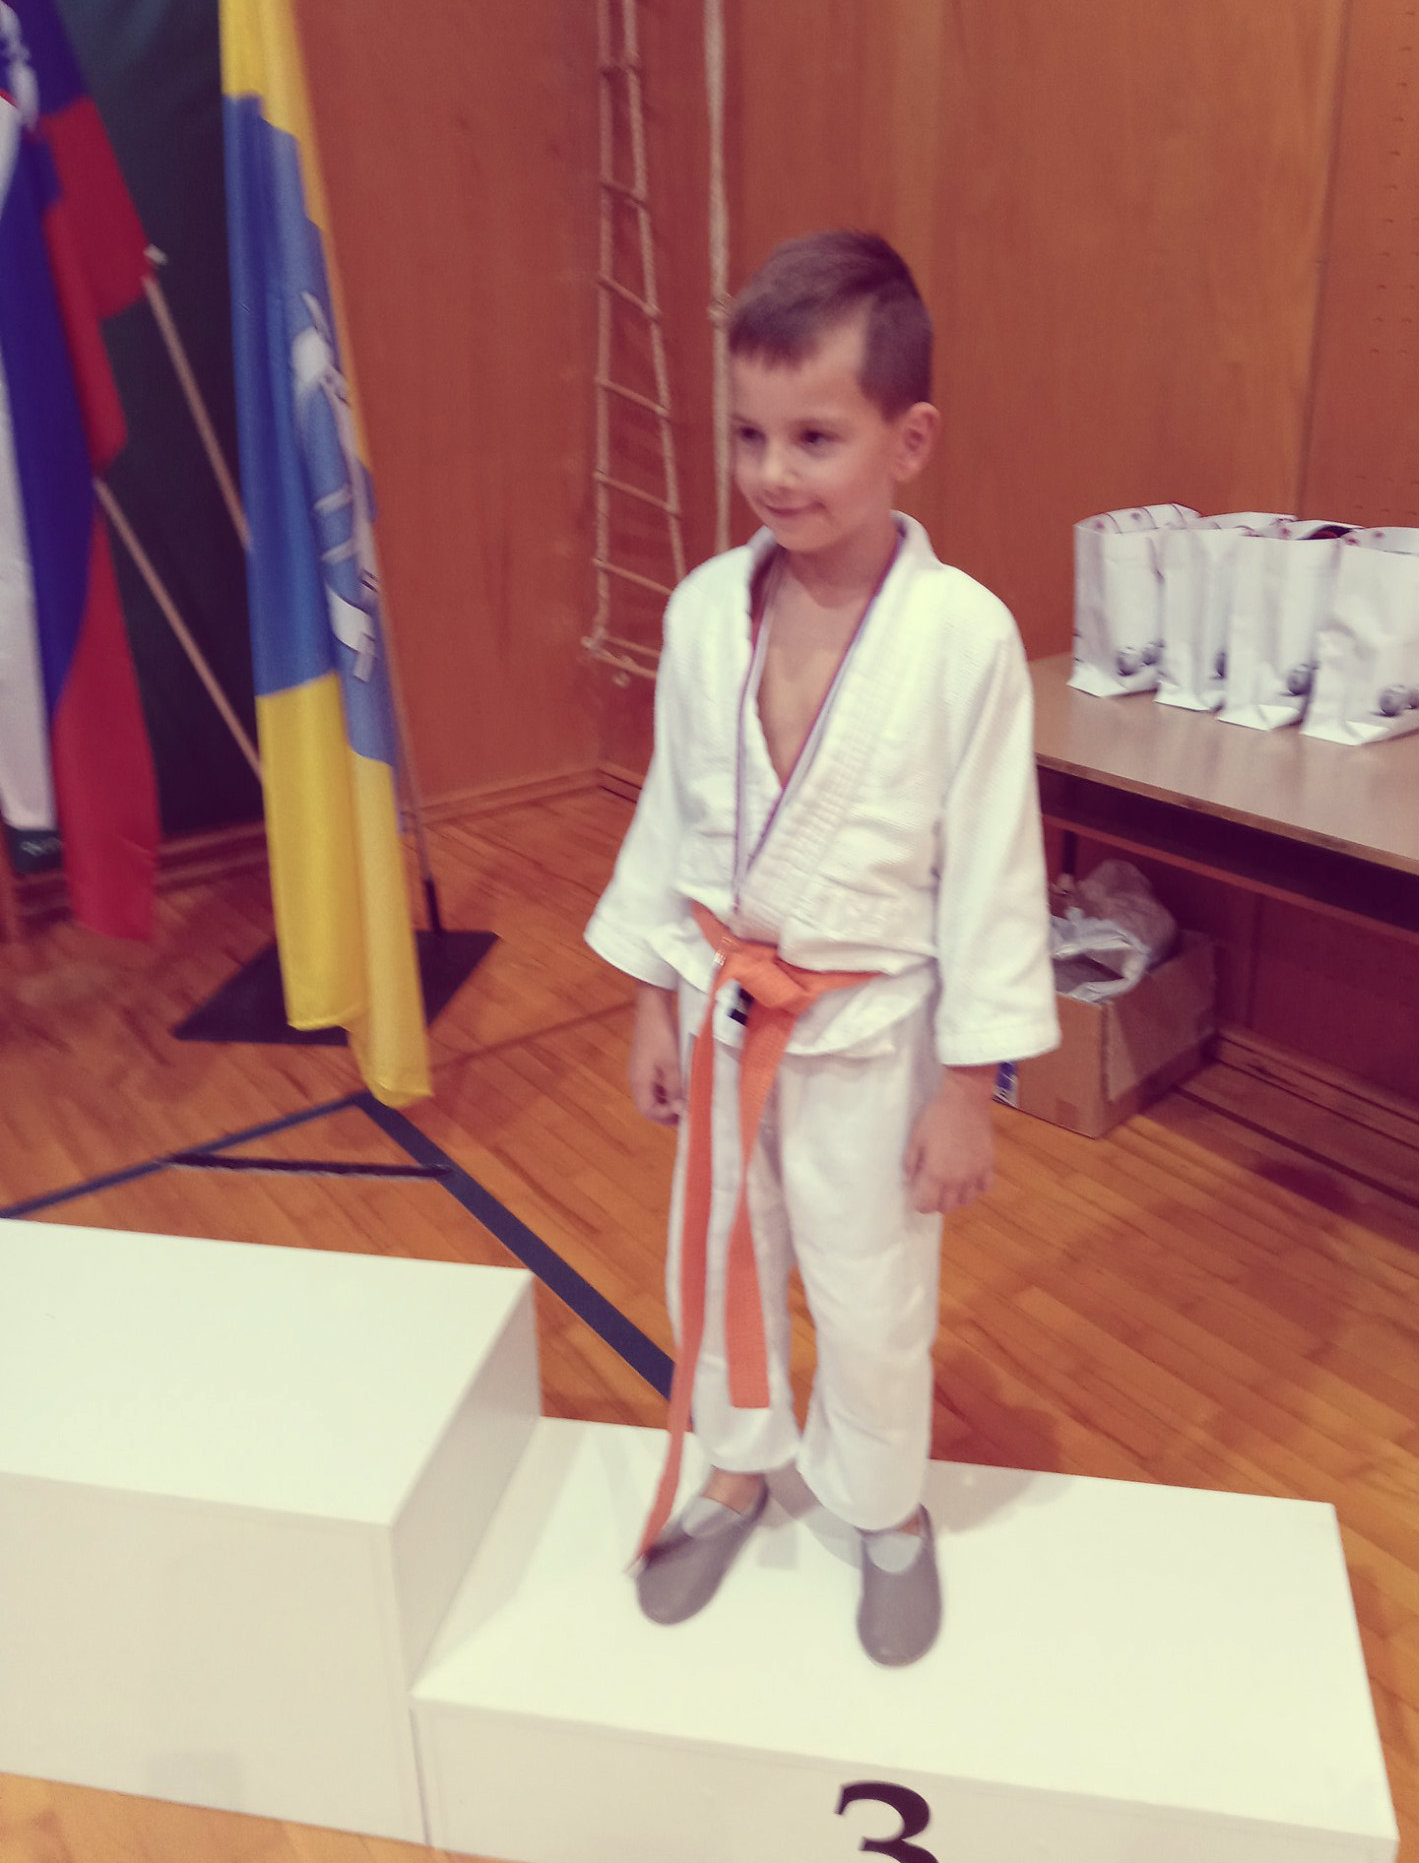 Miha z judo kluba bela krajina osviji 3. mesto